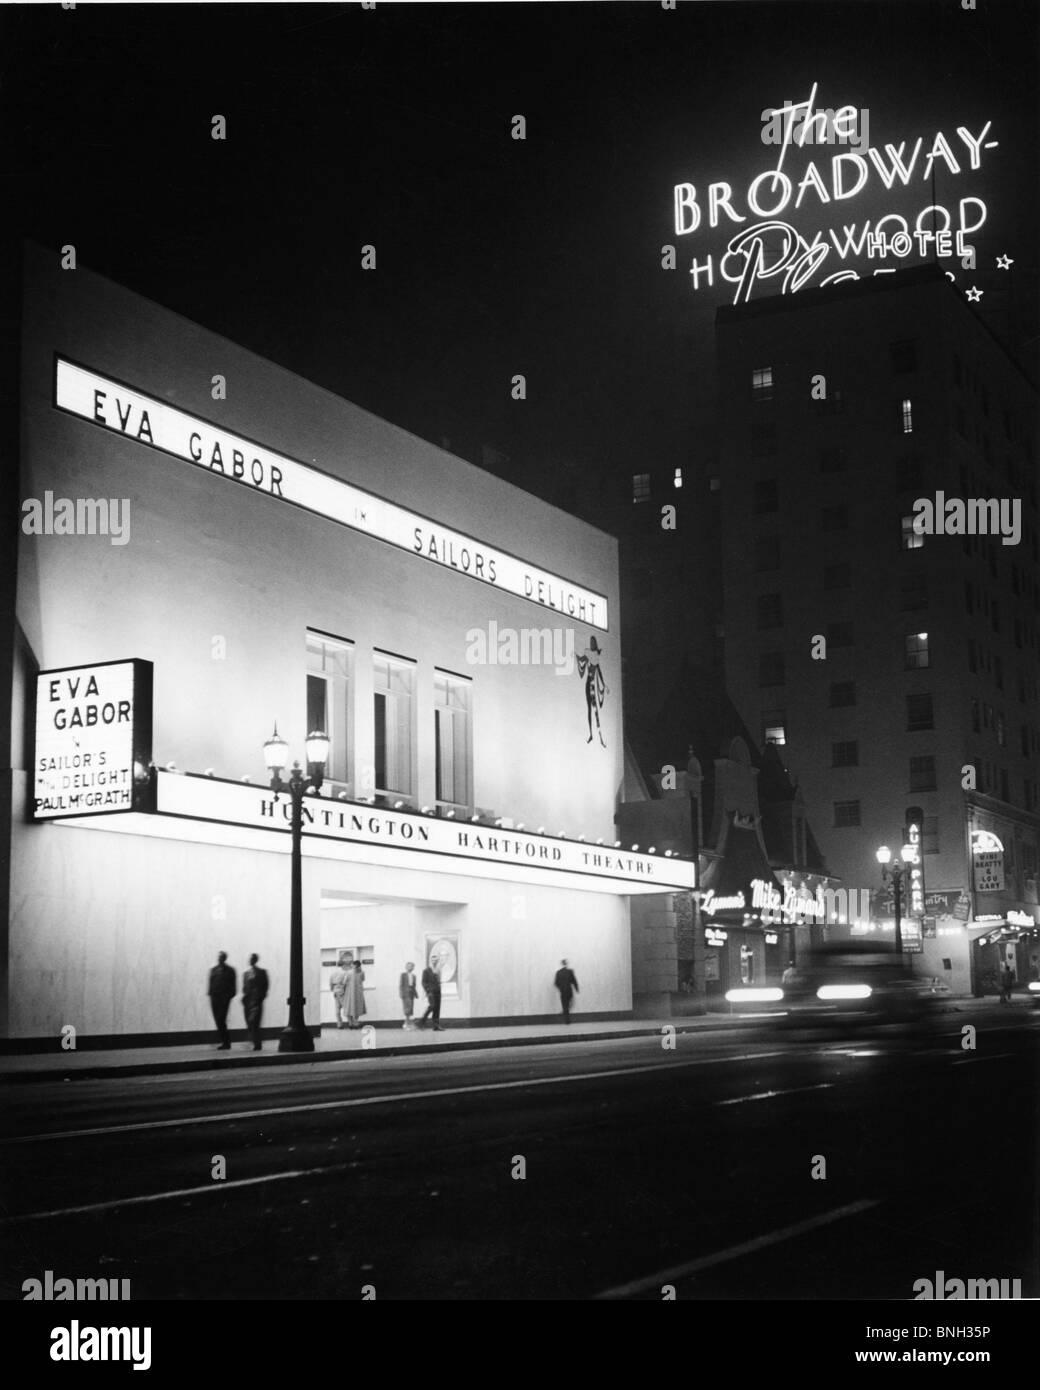 Movie theater lit up at night, Los Angeles, California, USA - Stock Image